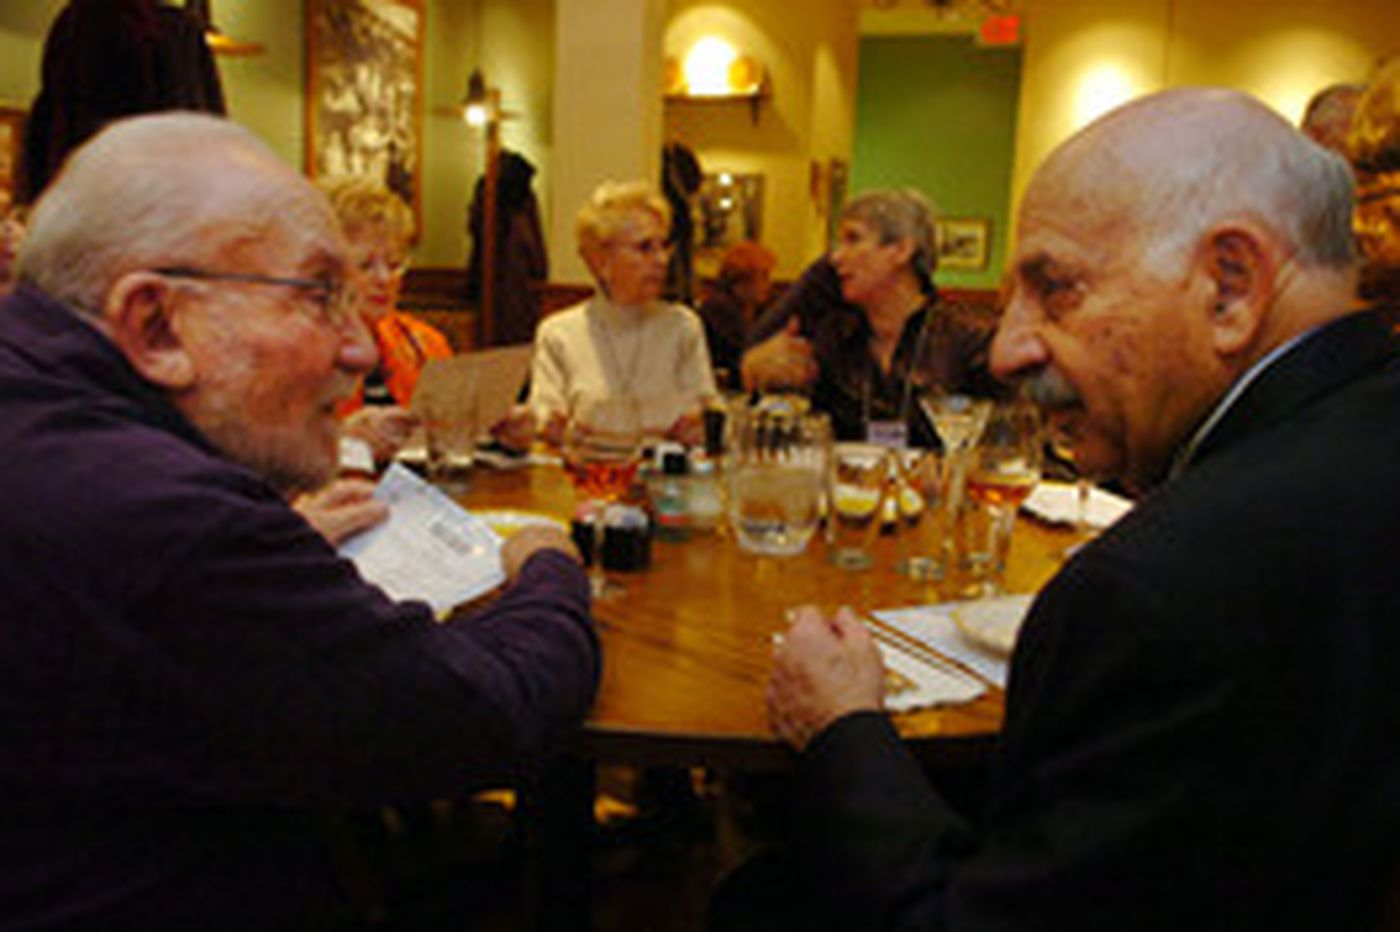 Seniors sharing friendship